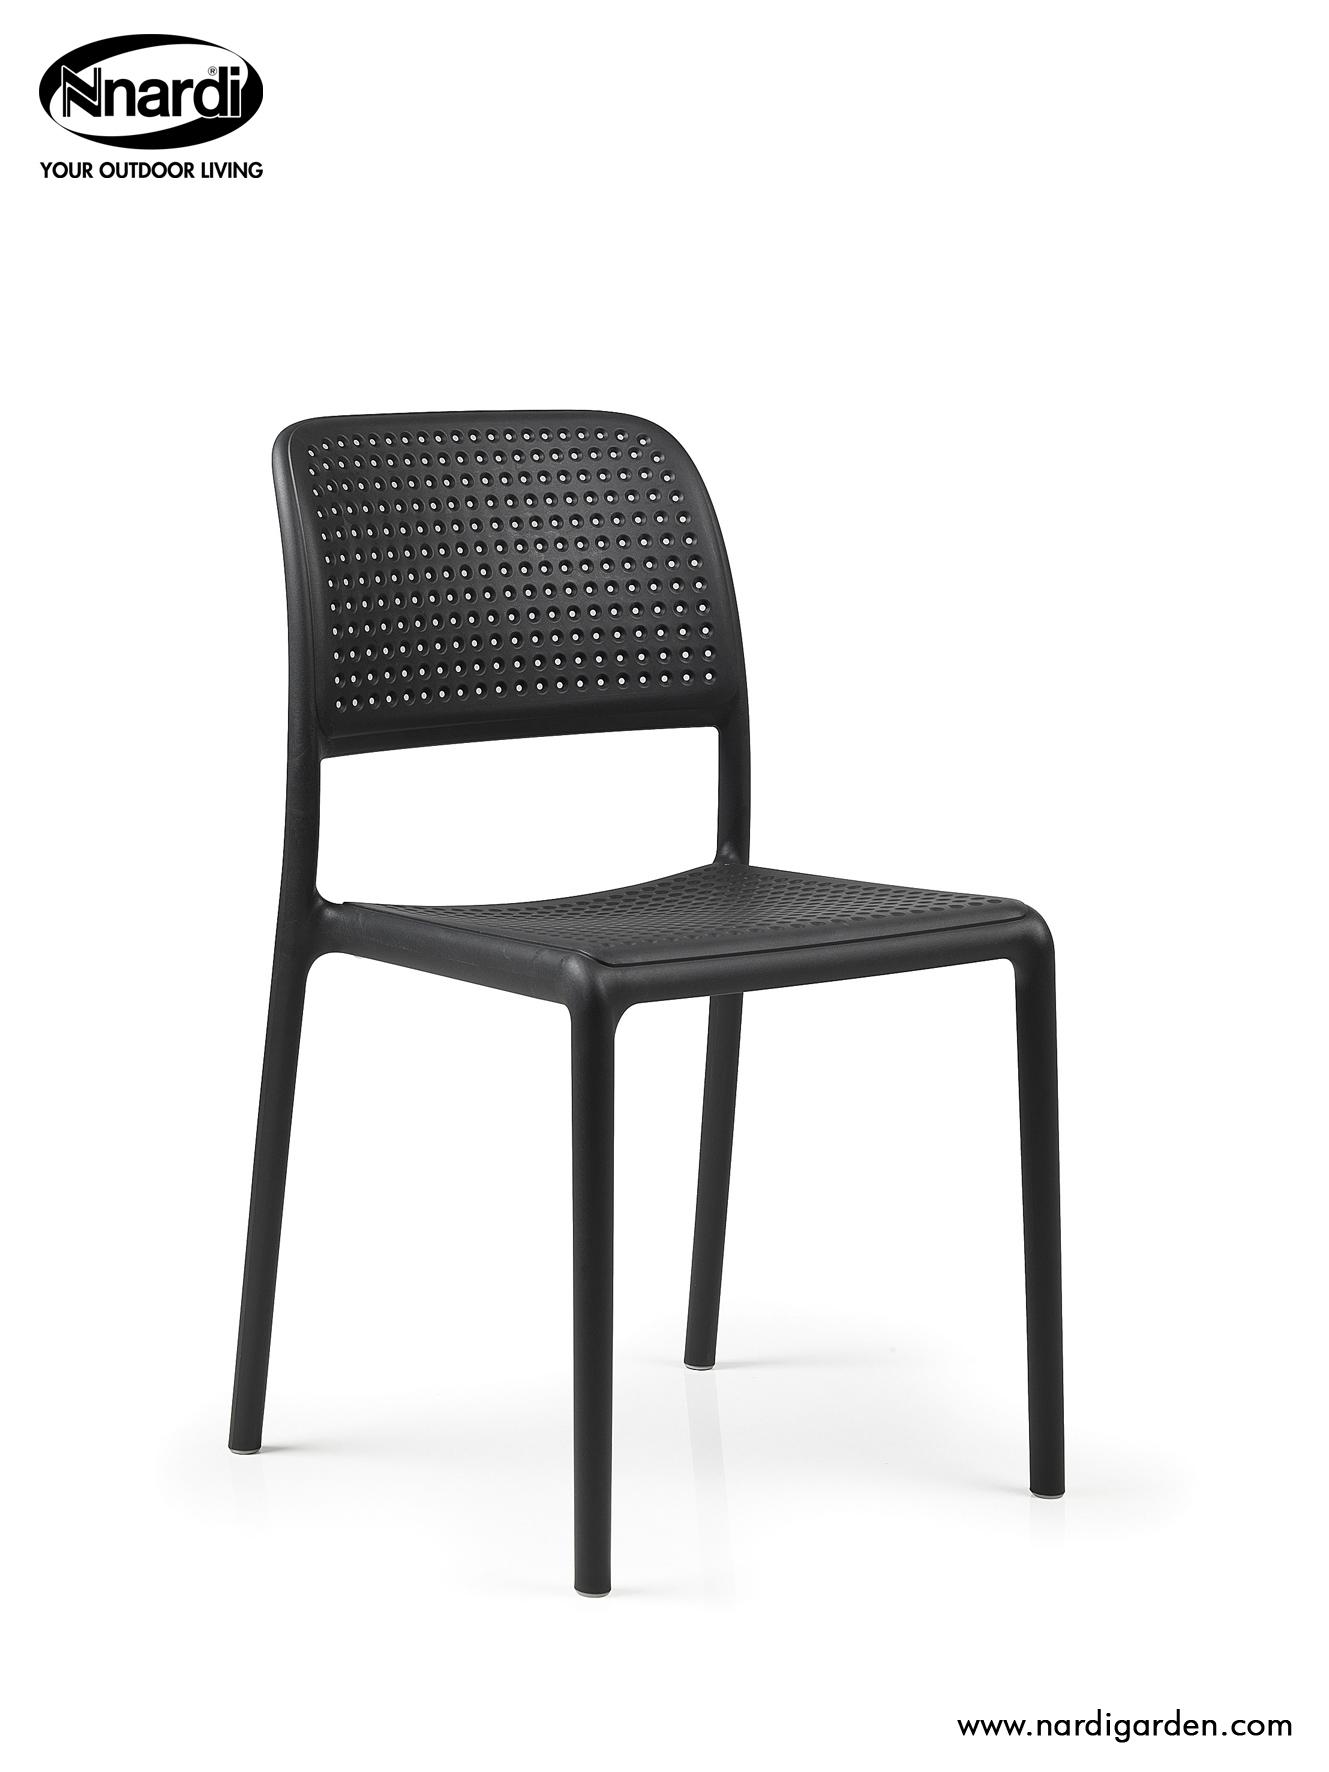 wellness und schwimmbad shop stuhl. Black Bedroom Furniture Sets. Home Design Ideas